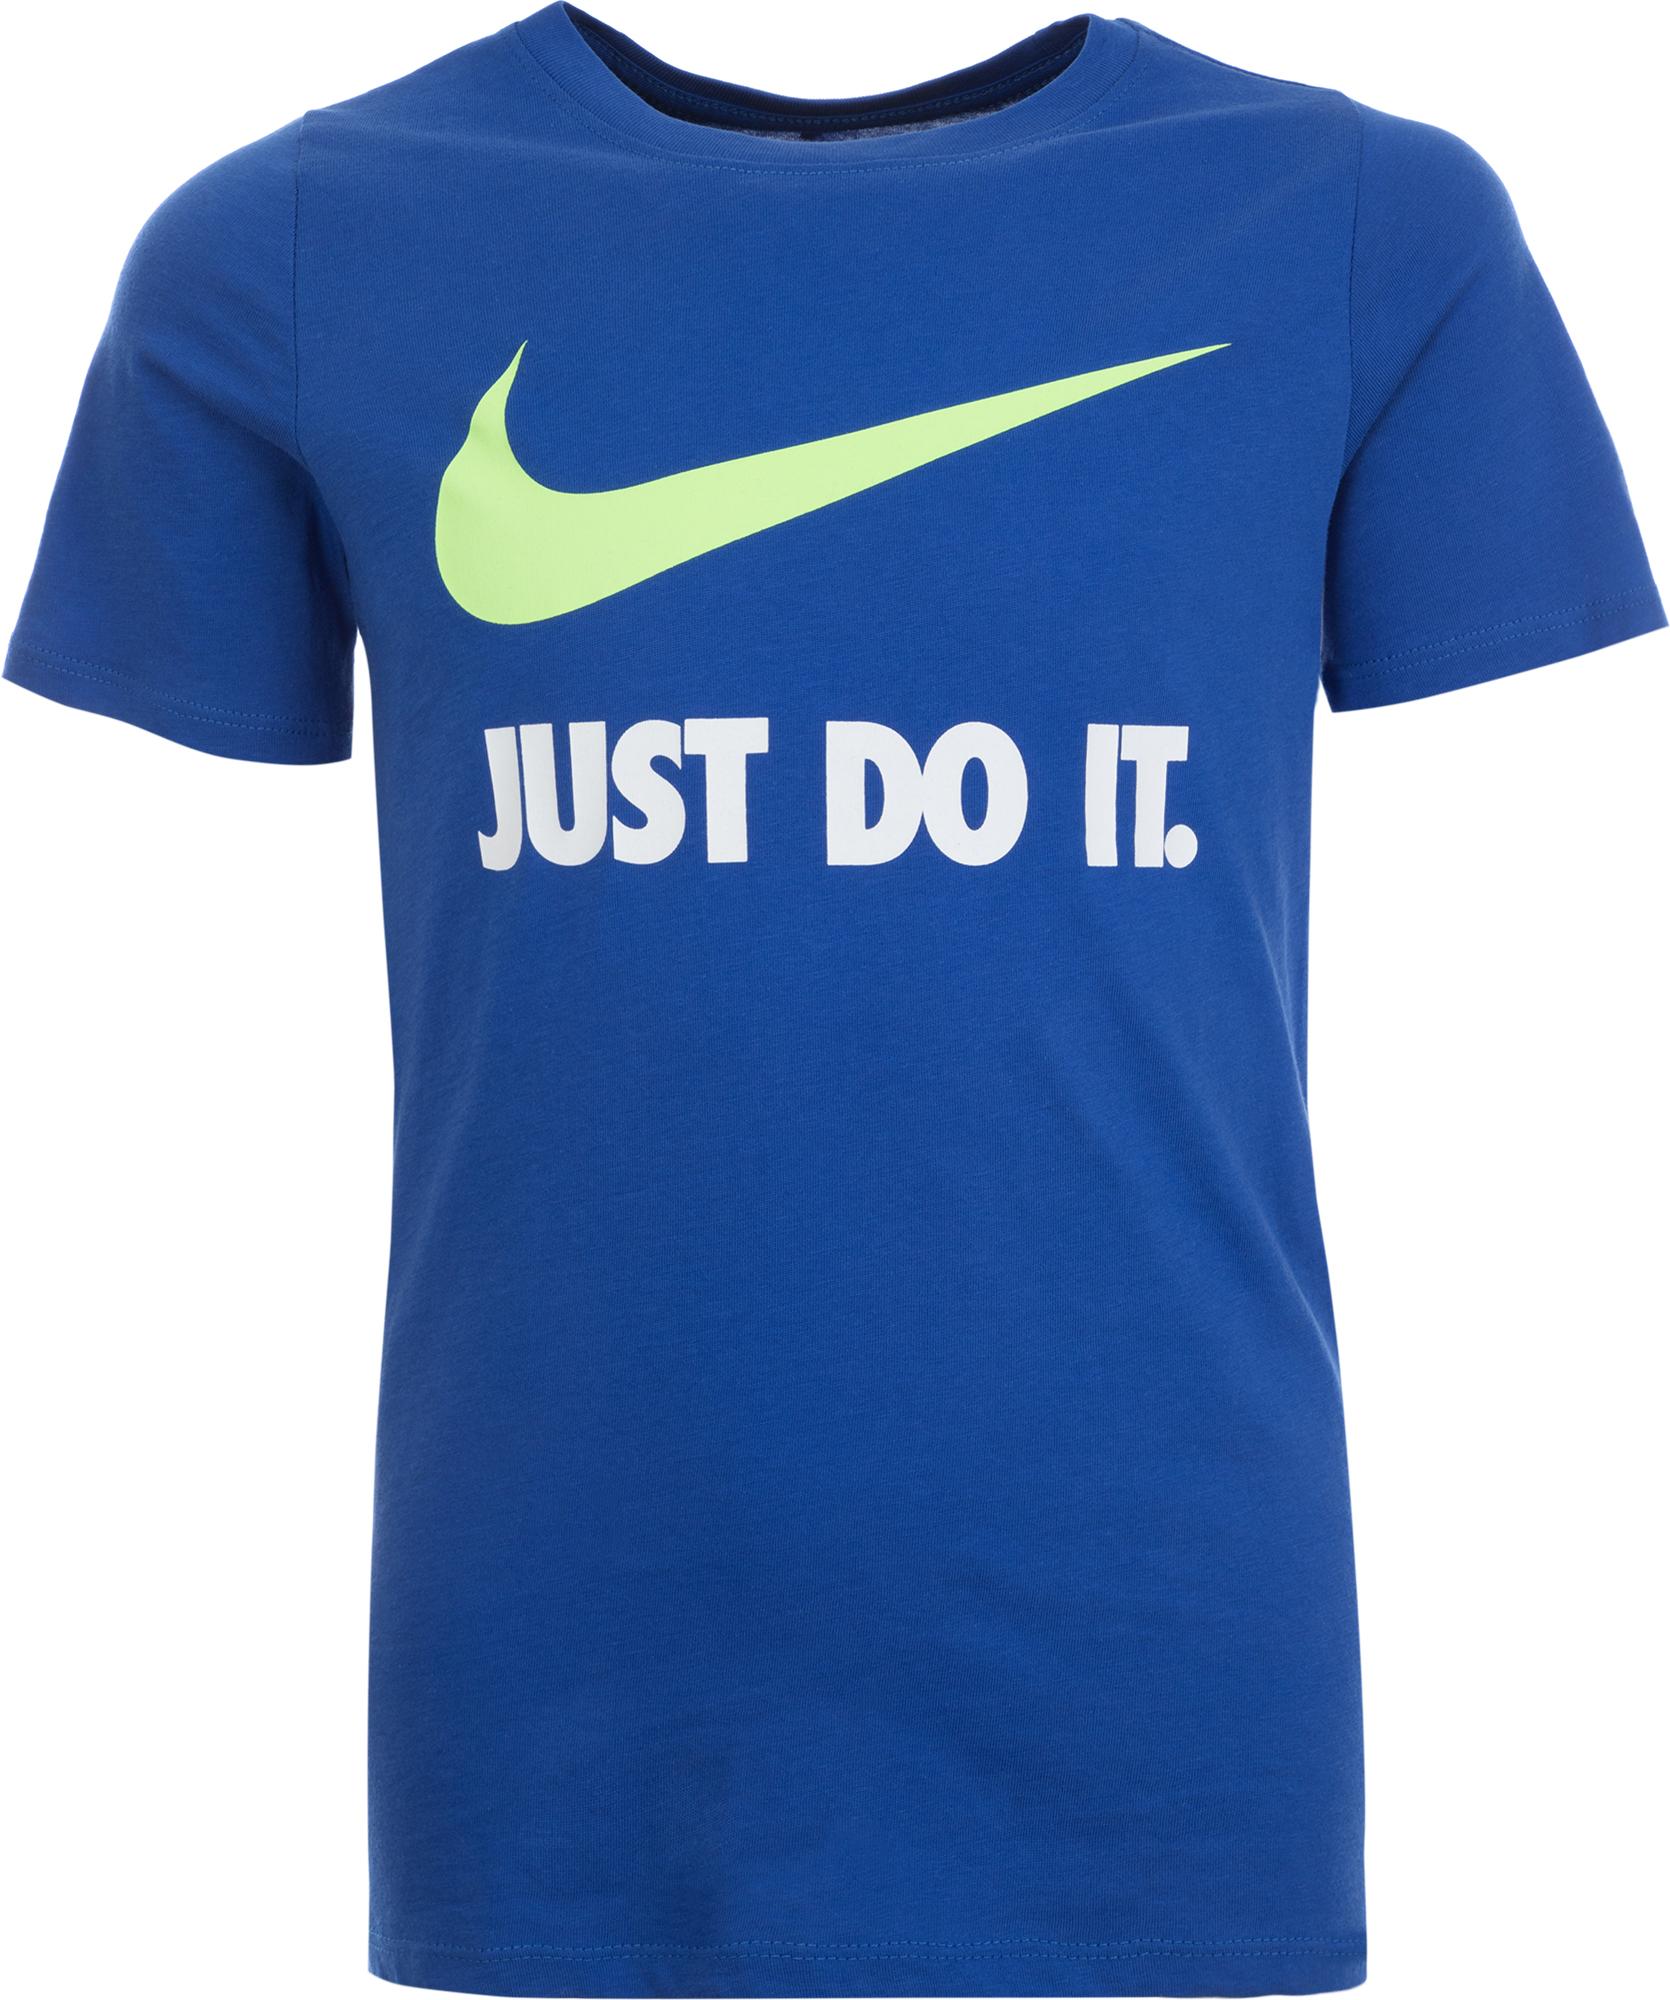 Nike Футболка для мальчиков Nike Just Do It, размер 137-147 цена